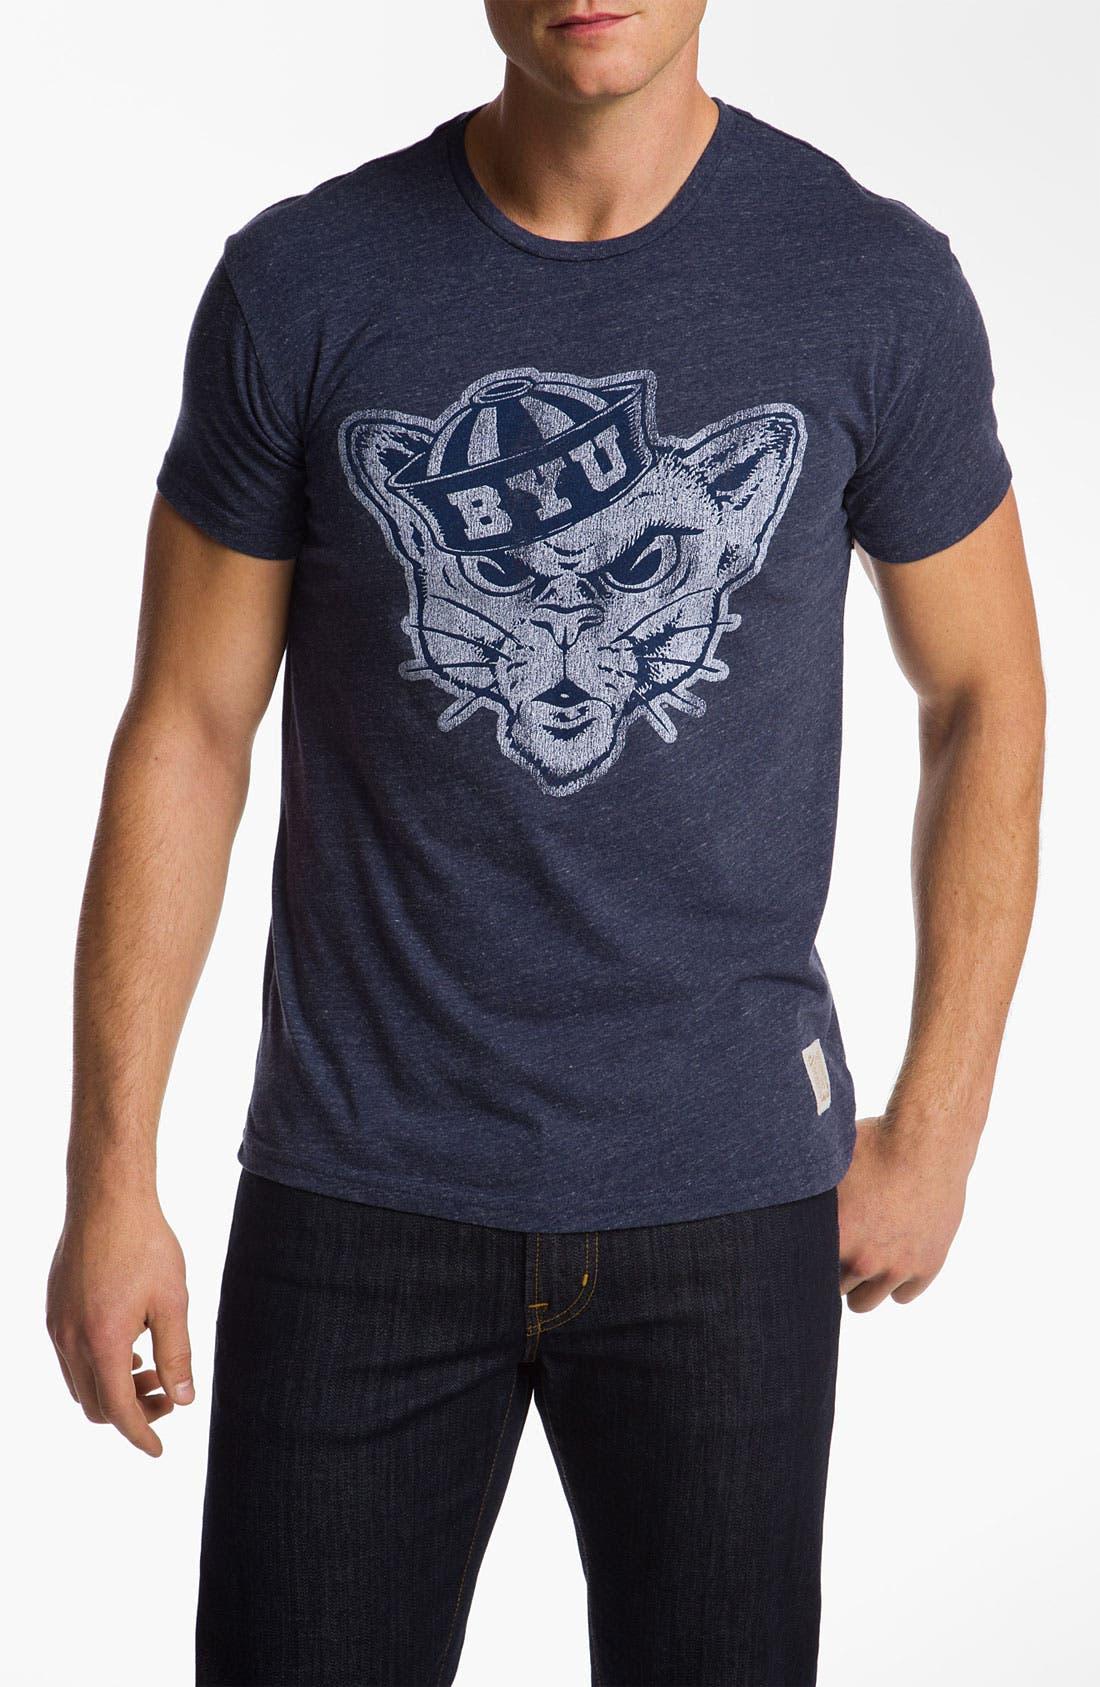 Alternate Image 1 Selected - The Original Retro Brand 'Brigham Young University' T-Shirt